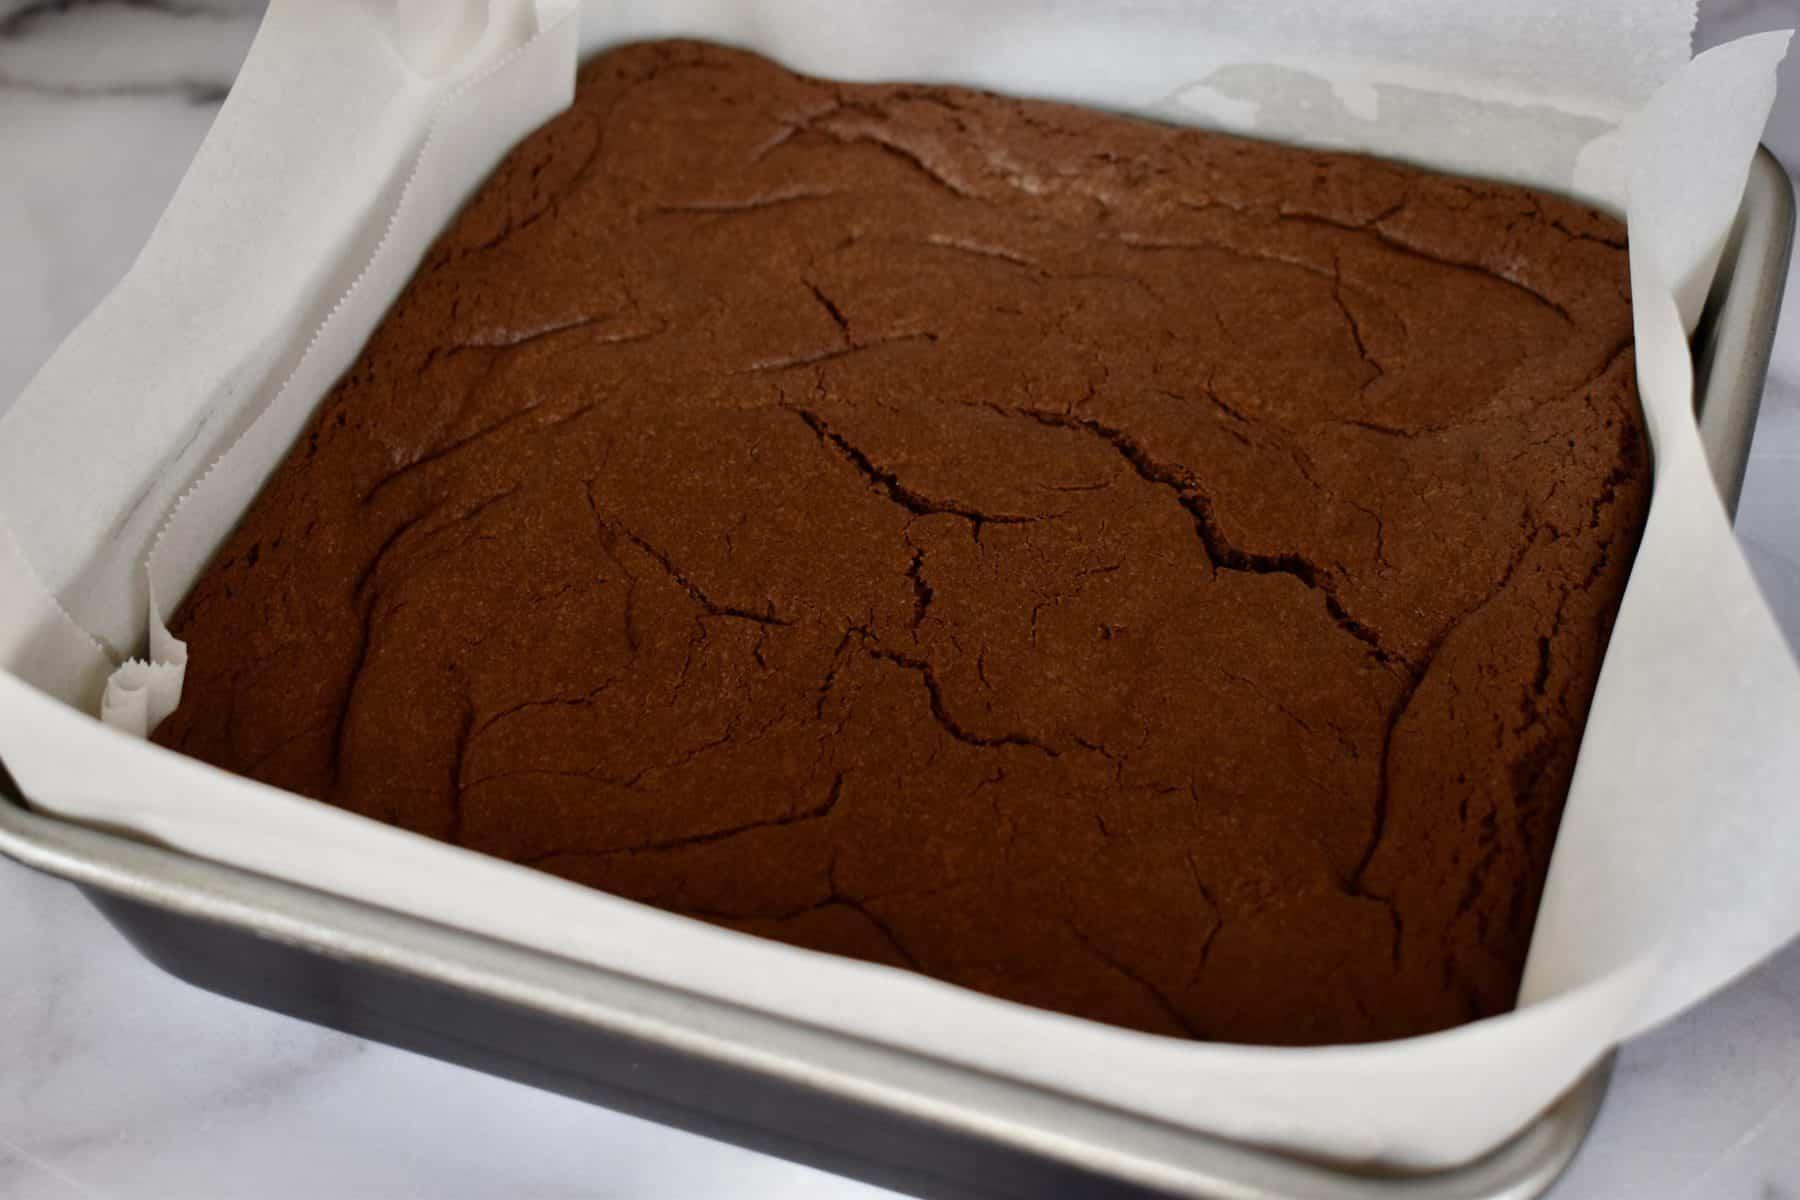 Cake Mix Brownies in a line baking pan.